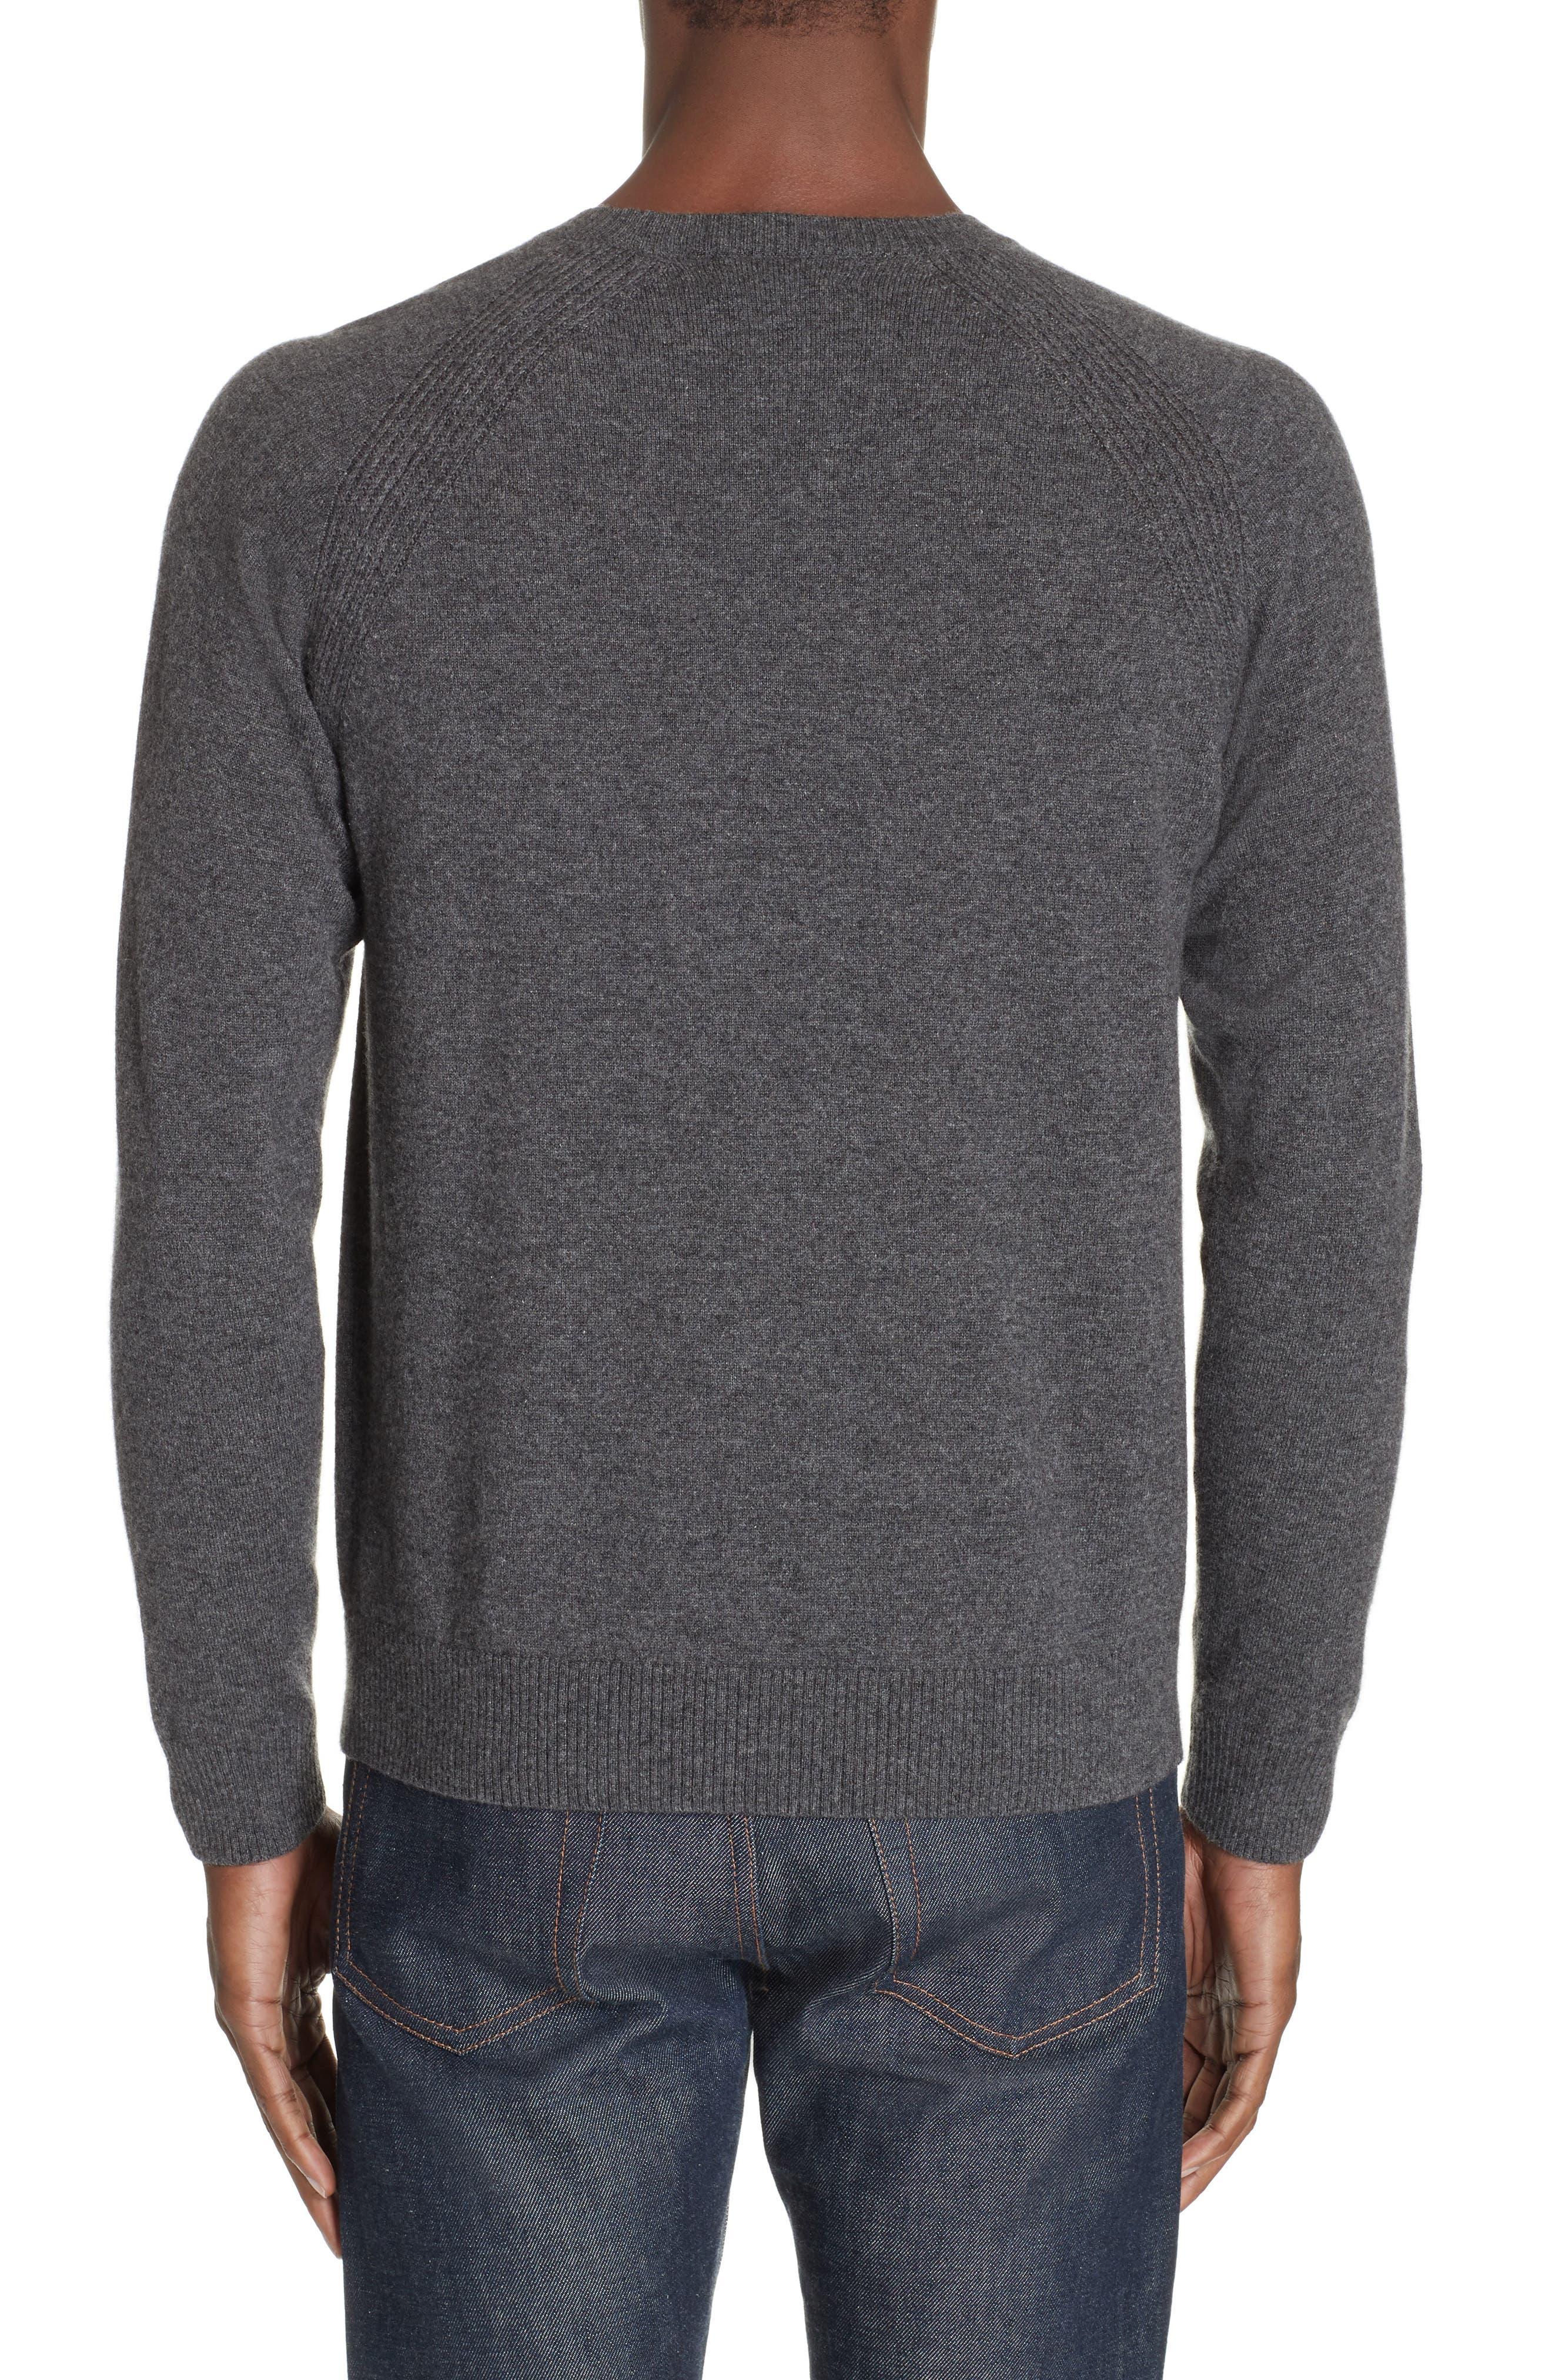 Cashmere Crewneck Sweater,                             Alternate thumbnail 2, color,                             ANTHRACITE